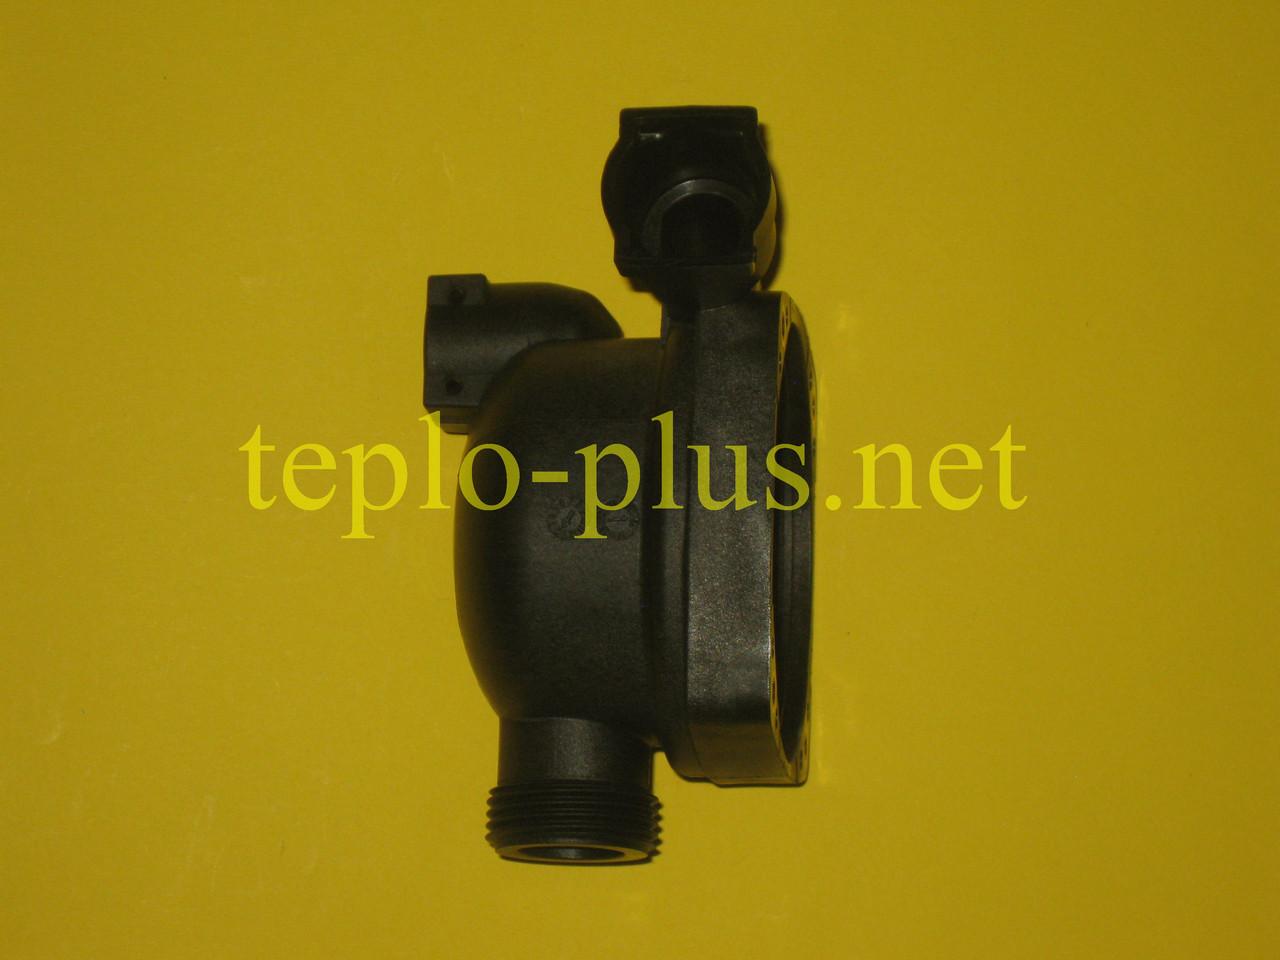 Задня частина (корпус, равлик) насоса 8716103601 Bosch Gaz 4000 W ZSA24-2 AD/KD, ZWA24-2 A/K, ZWA24-2 AD/KD, фото 3